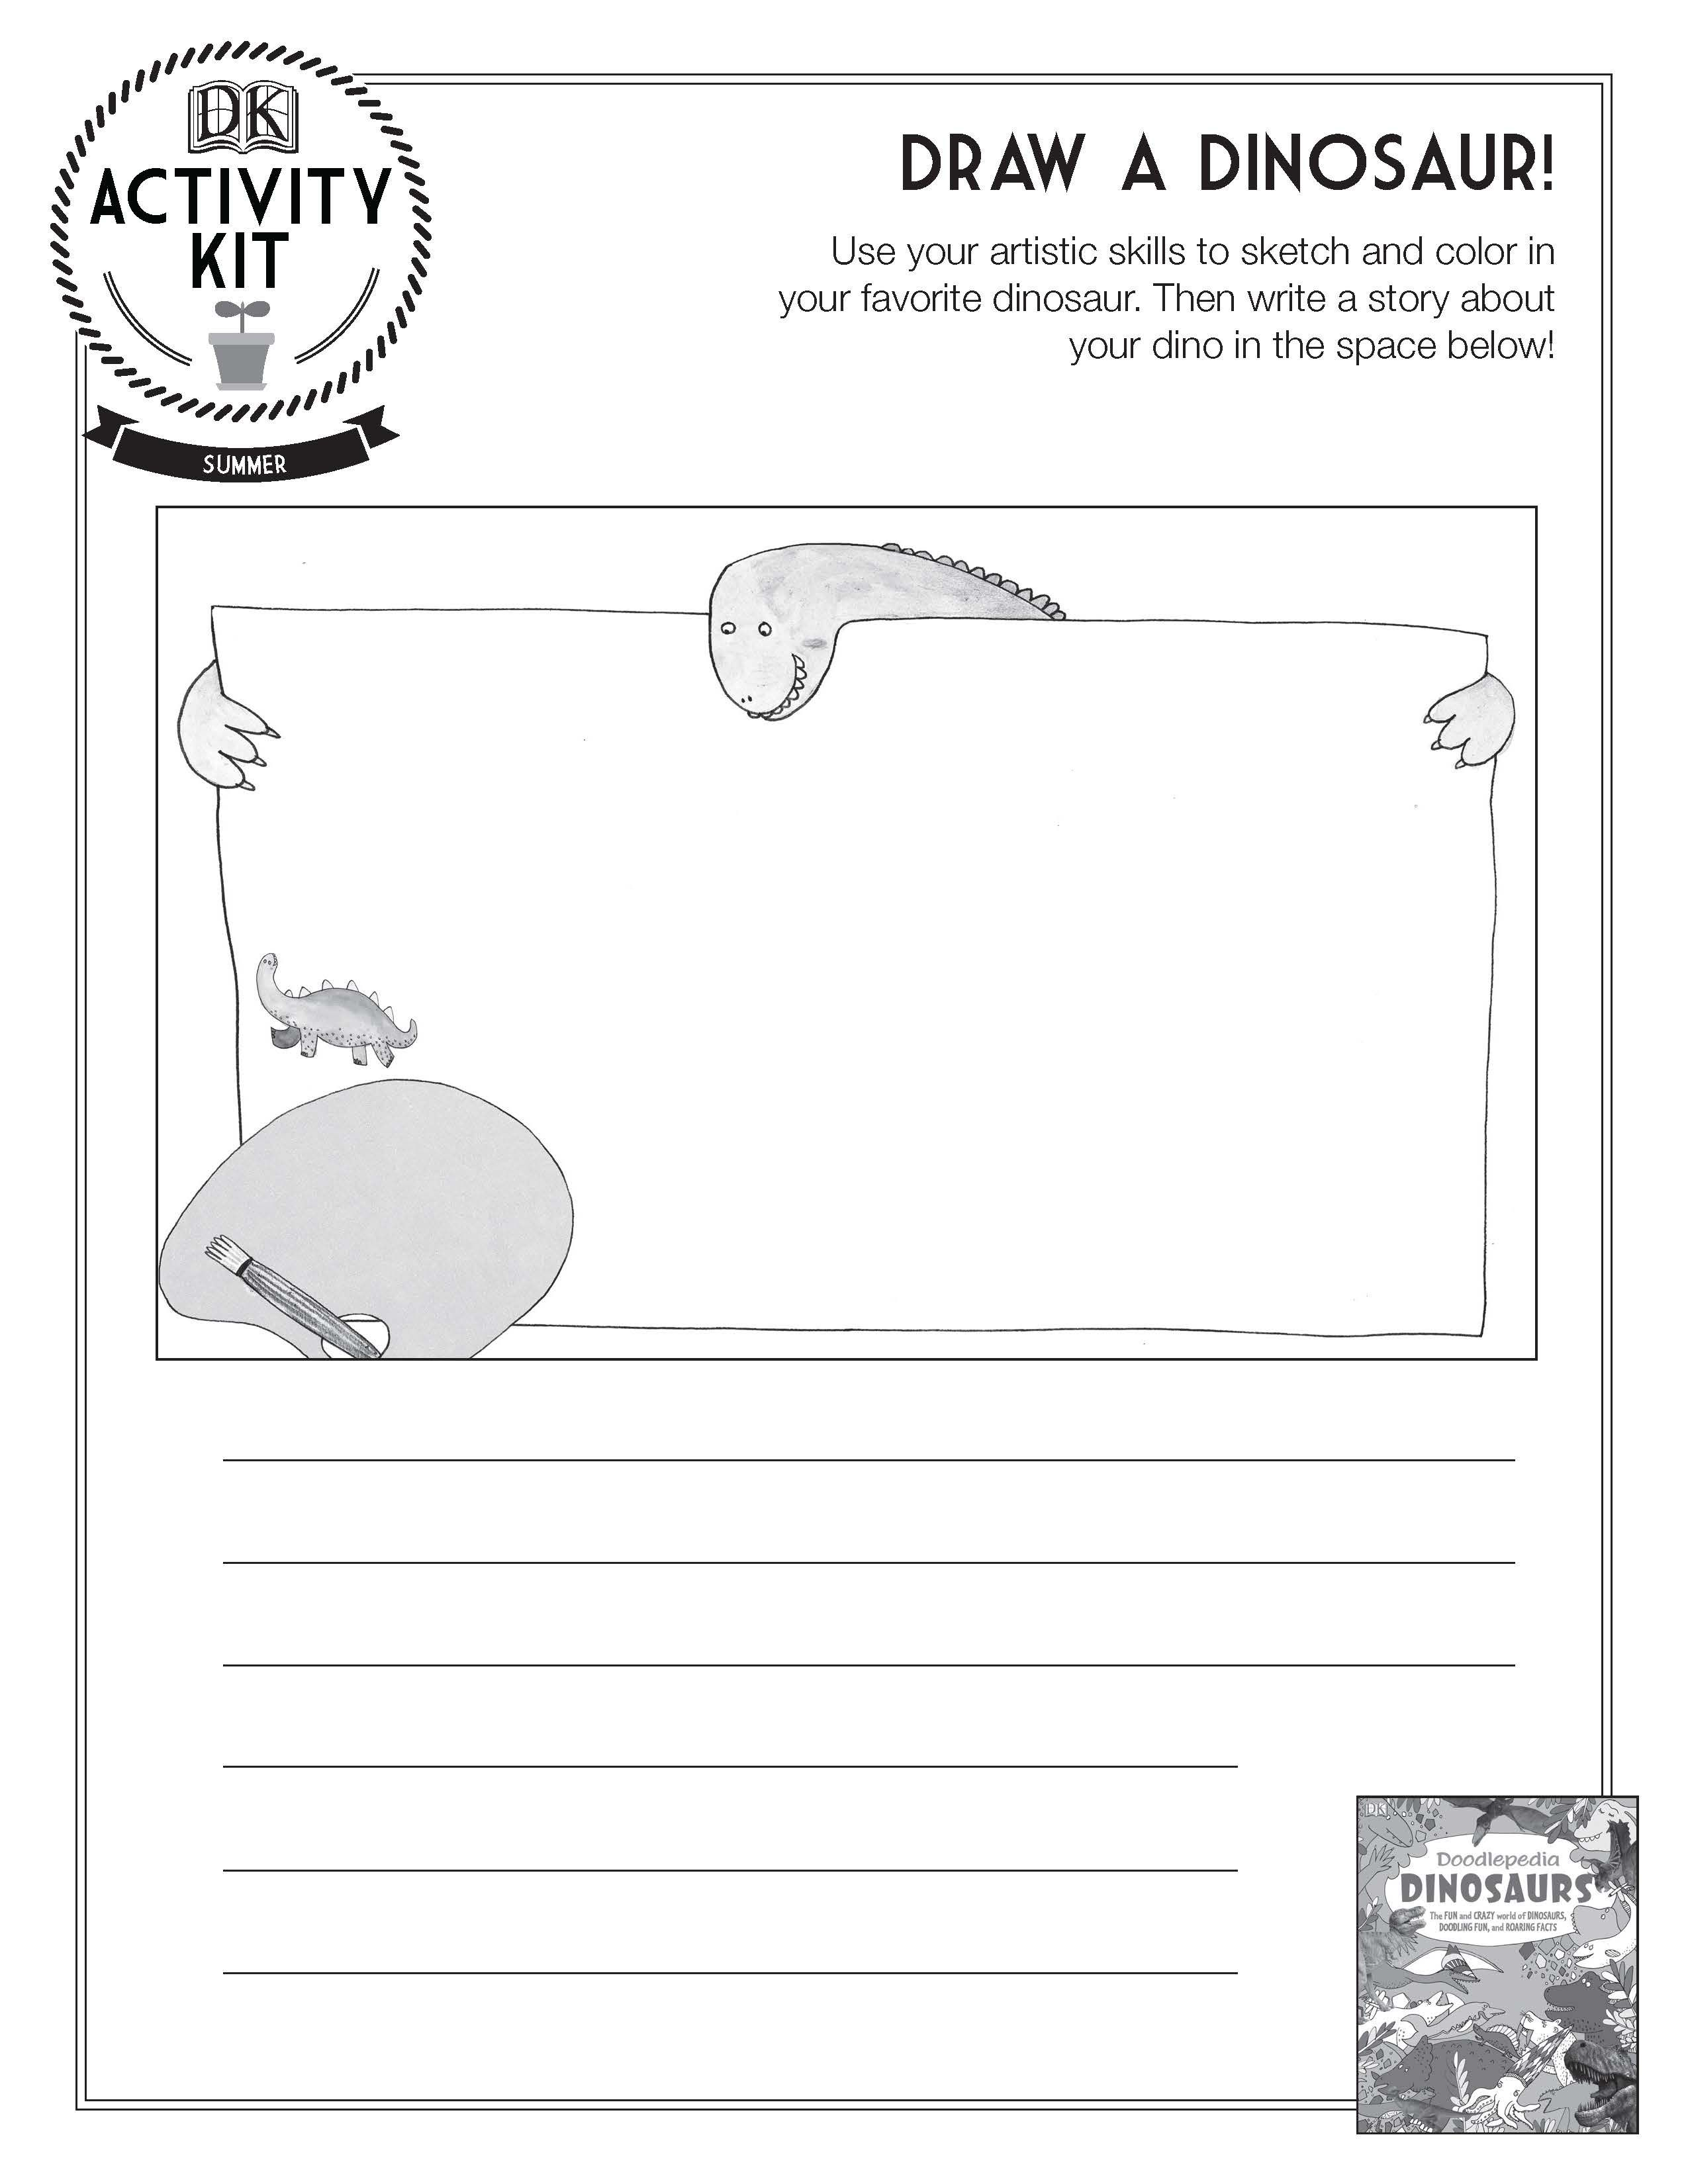 Draw a dinosaur activity sheet great idea for a writing prompt draw a dinosaur activity sheet great idea for a writing prompt ccuart Images